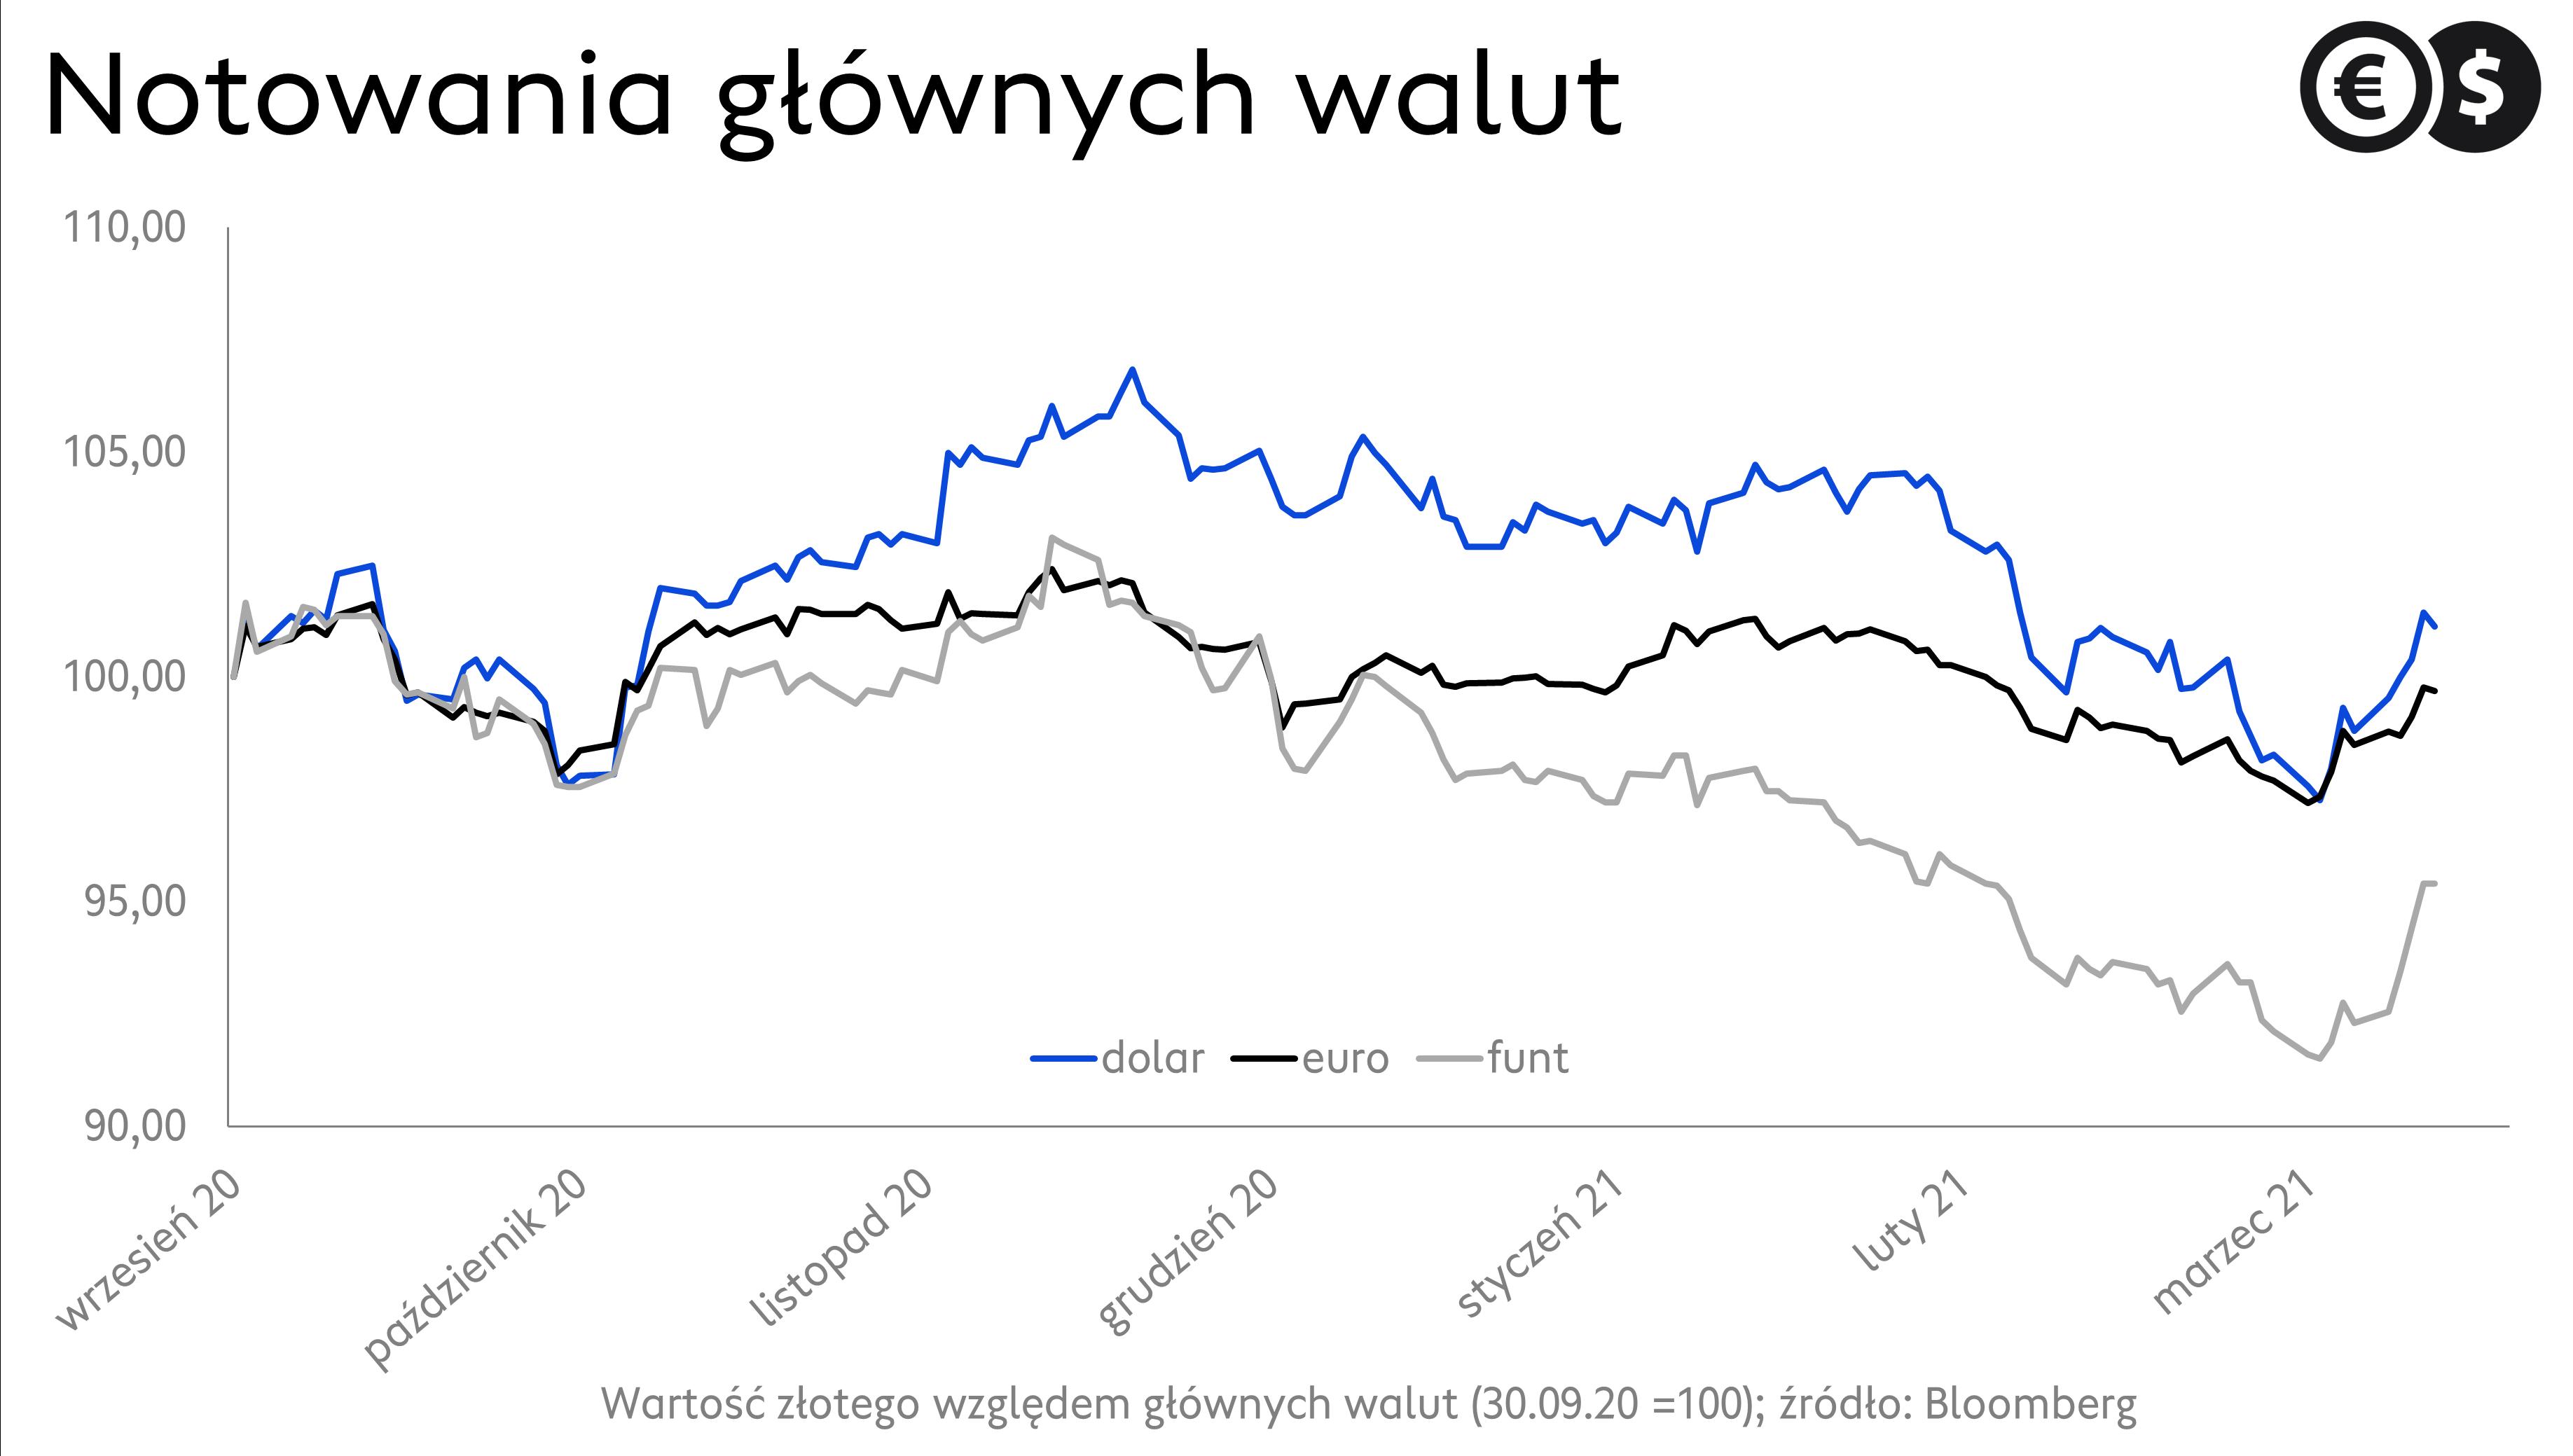 Kursy walut, wykres EUR/PLN, USD/PLN i GBP/PLN; źródło: Bloomberg